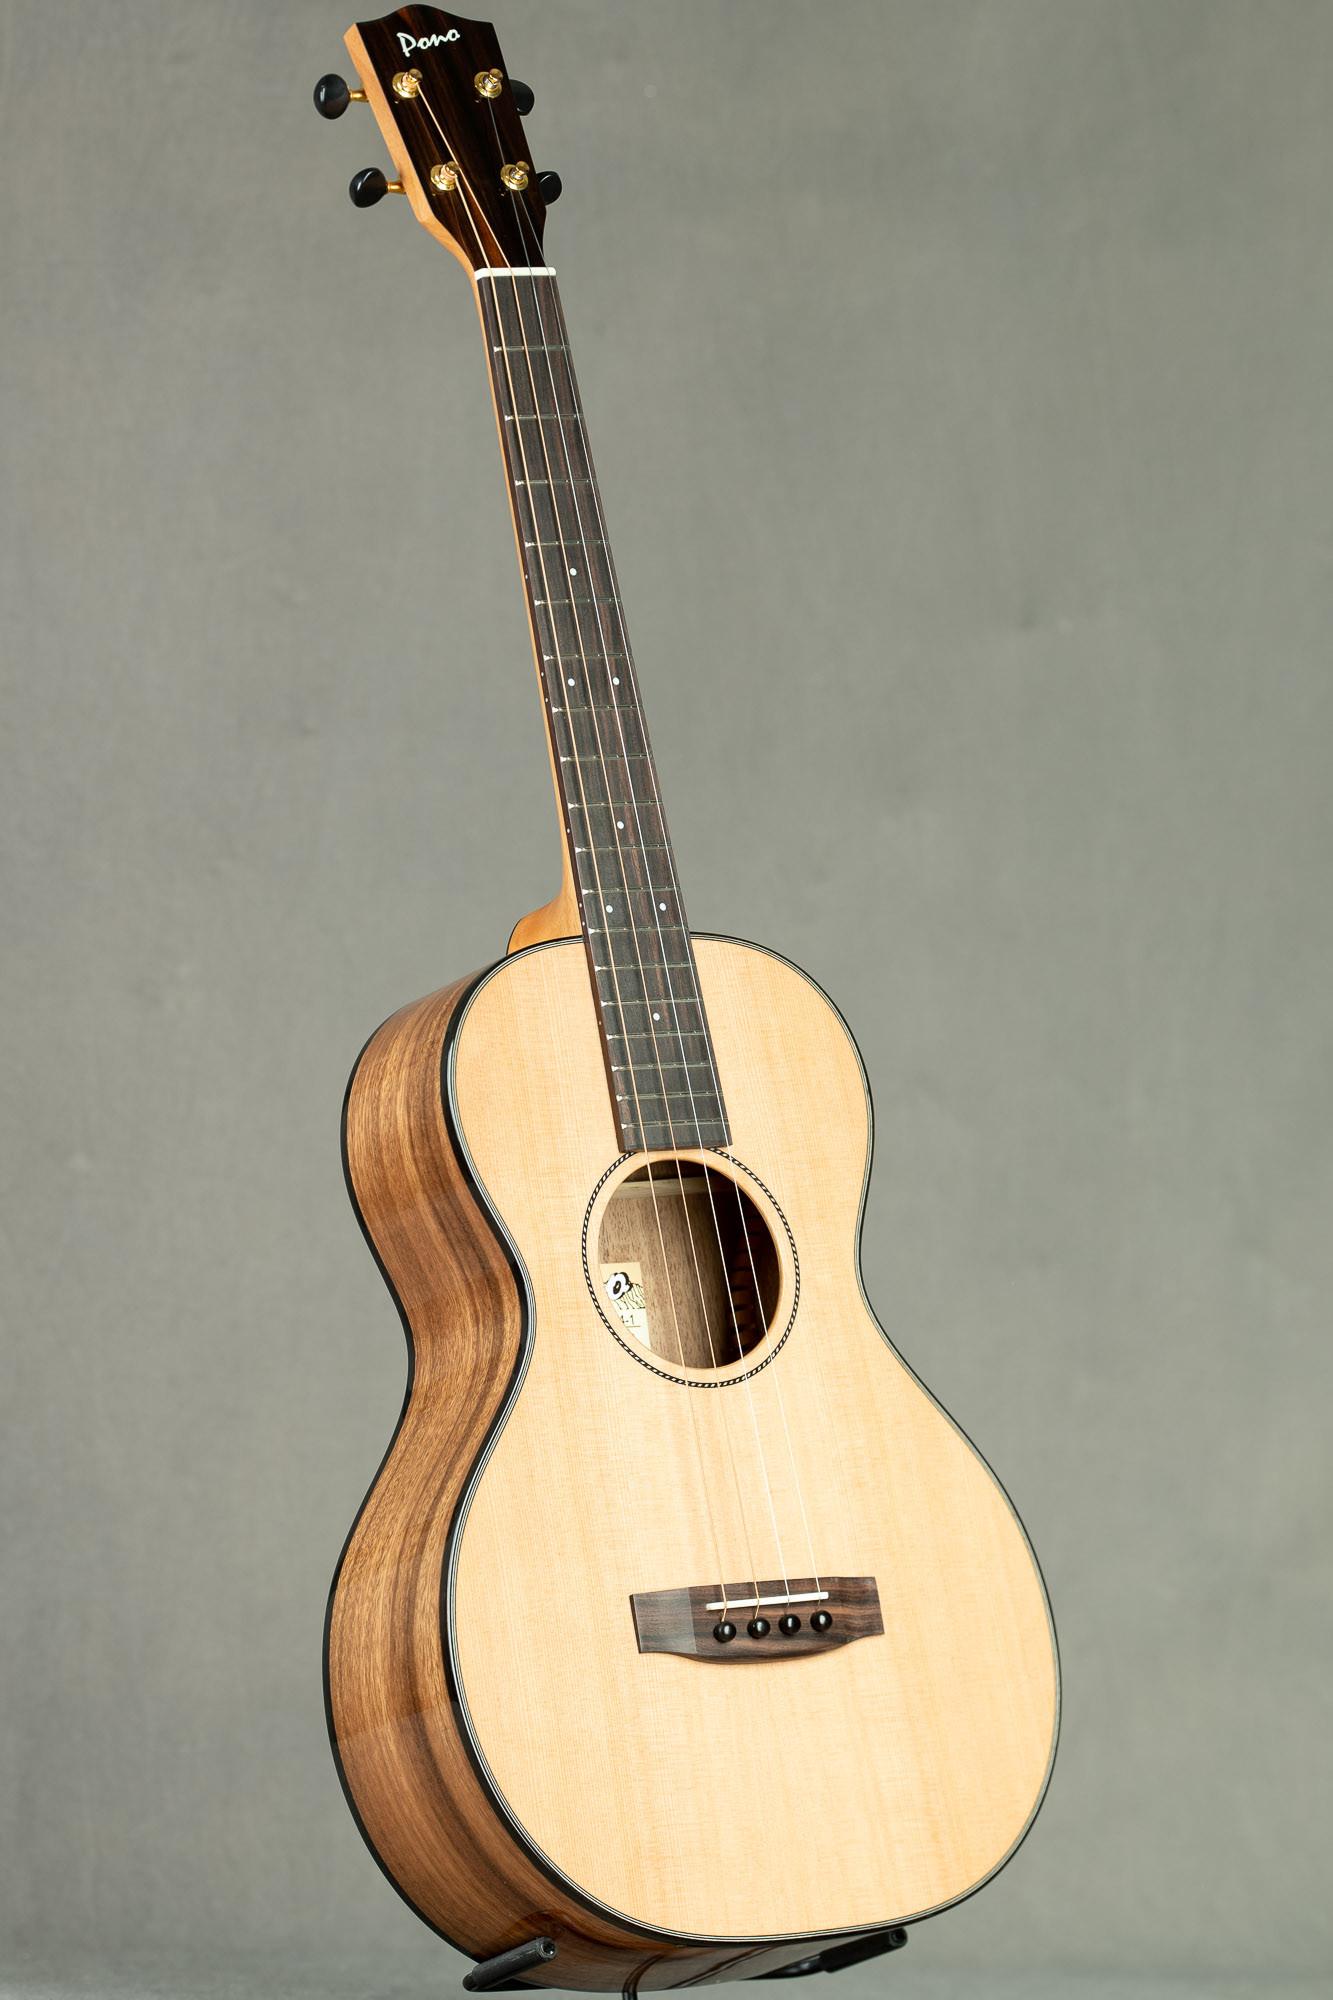 Pono Cedar Acacia Steel String Baritone (UL4-1 2890)